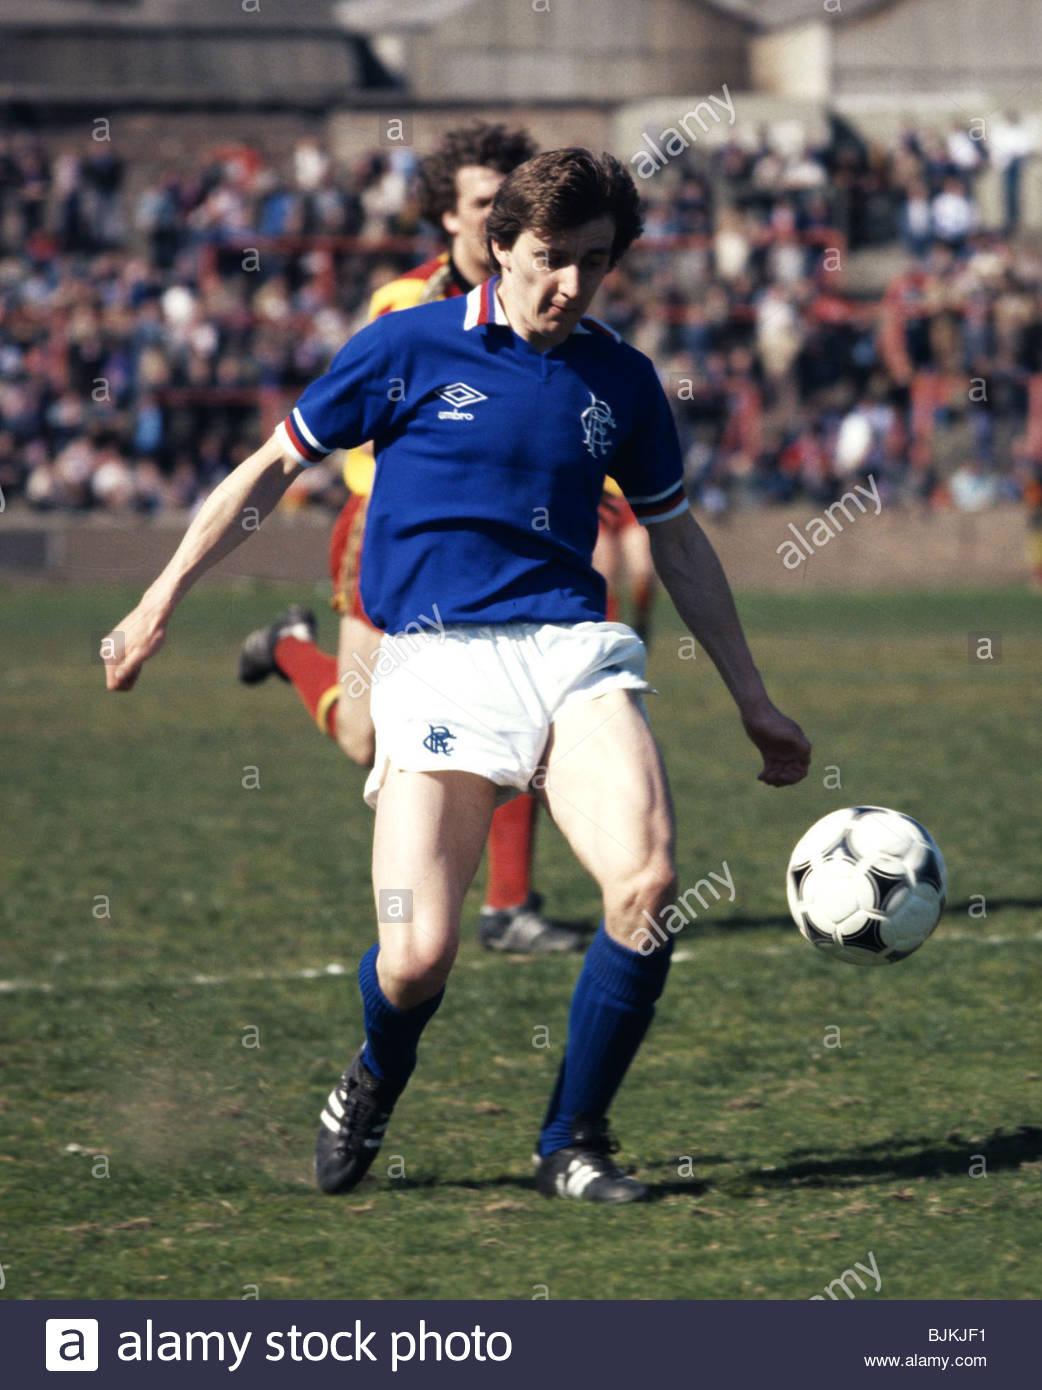 SEASON 1980/1981 PARTICK THISTLE v RANGERS FIRHILL - GLASGOW Bobby Russell in action for Rangers. - Stock Image